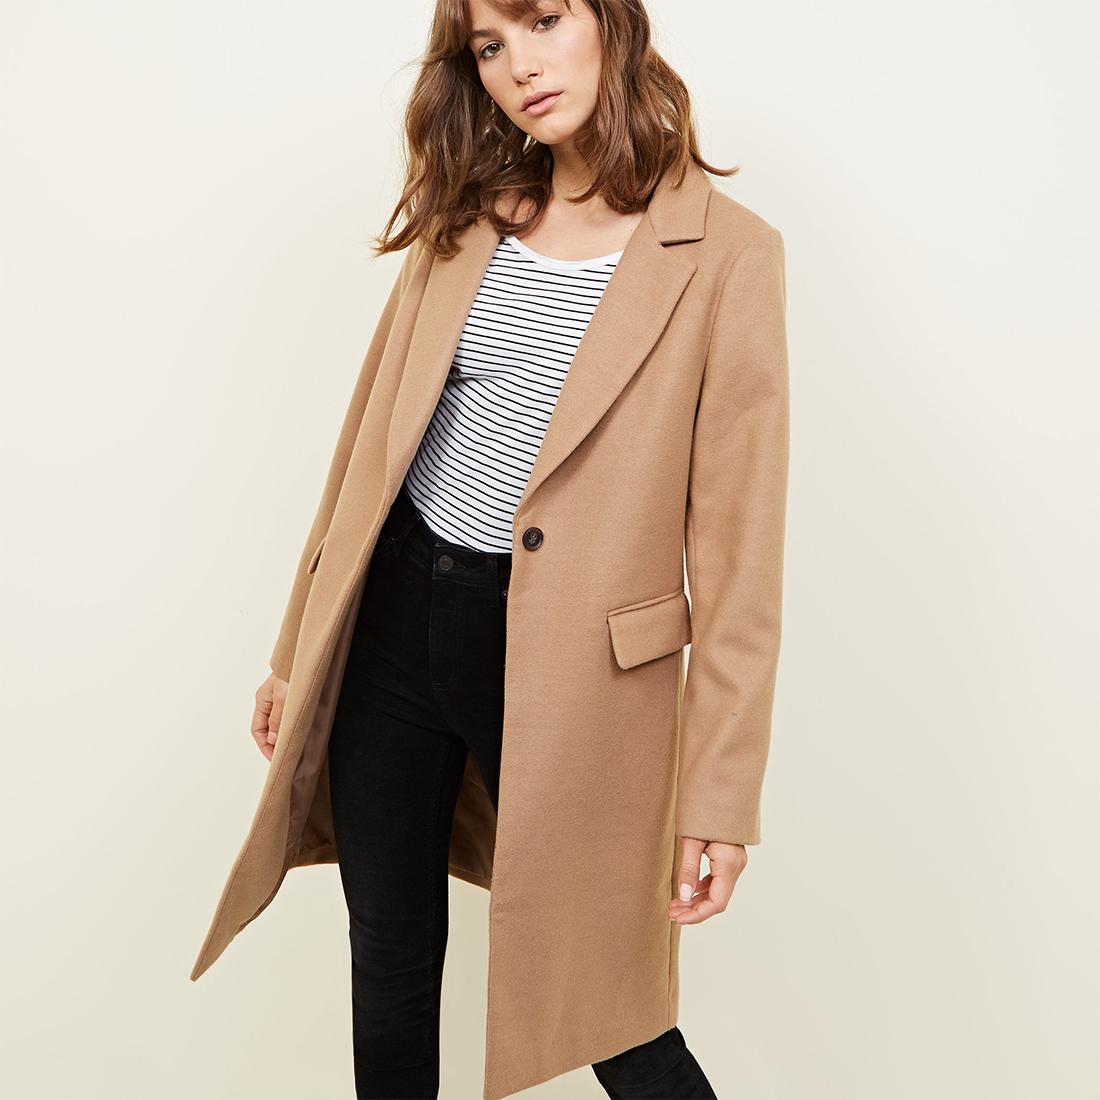 New Look, £34.99